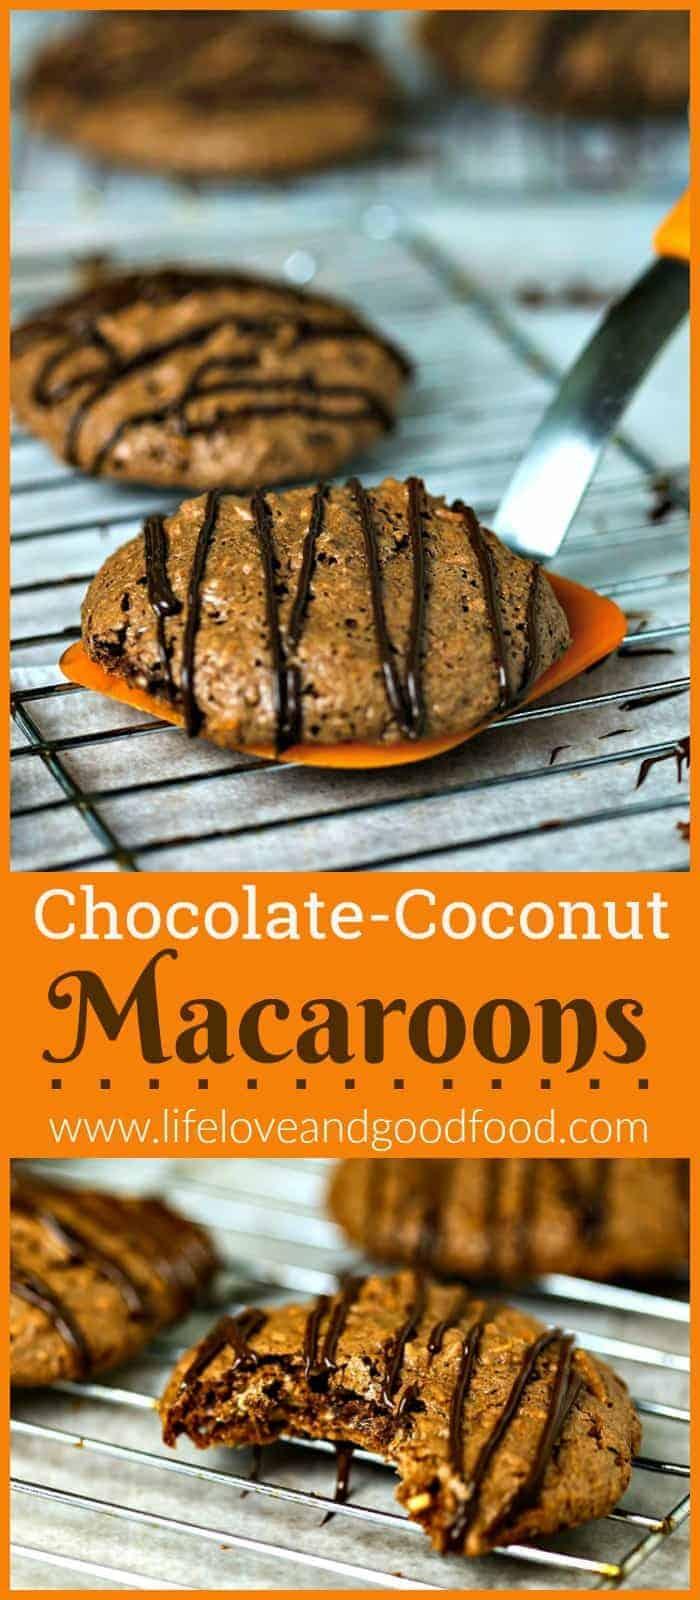 Chocolate-Coconut Macaroons | Life, Love, and Good Food